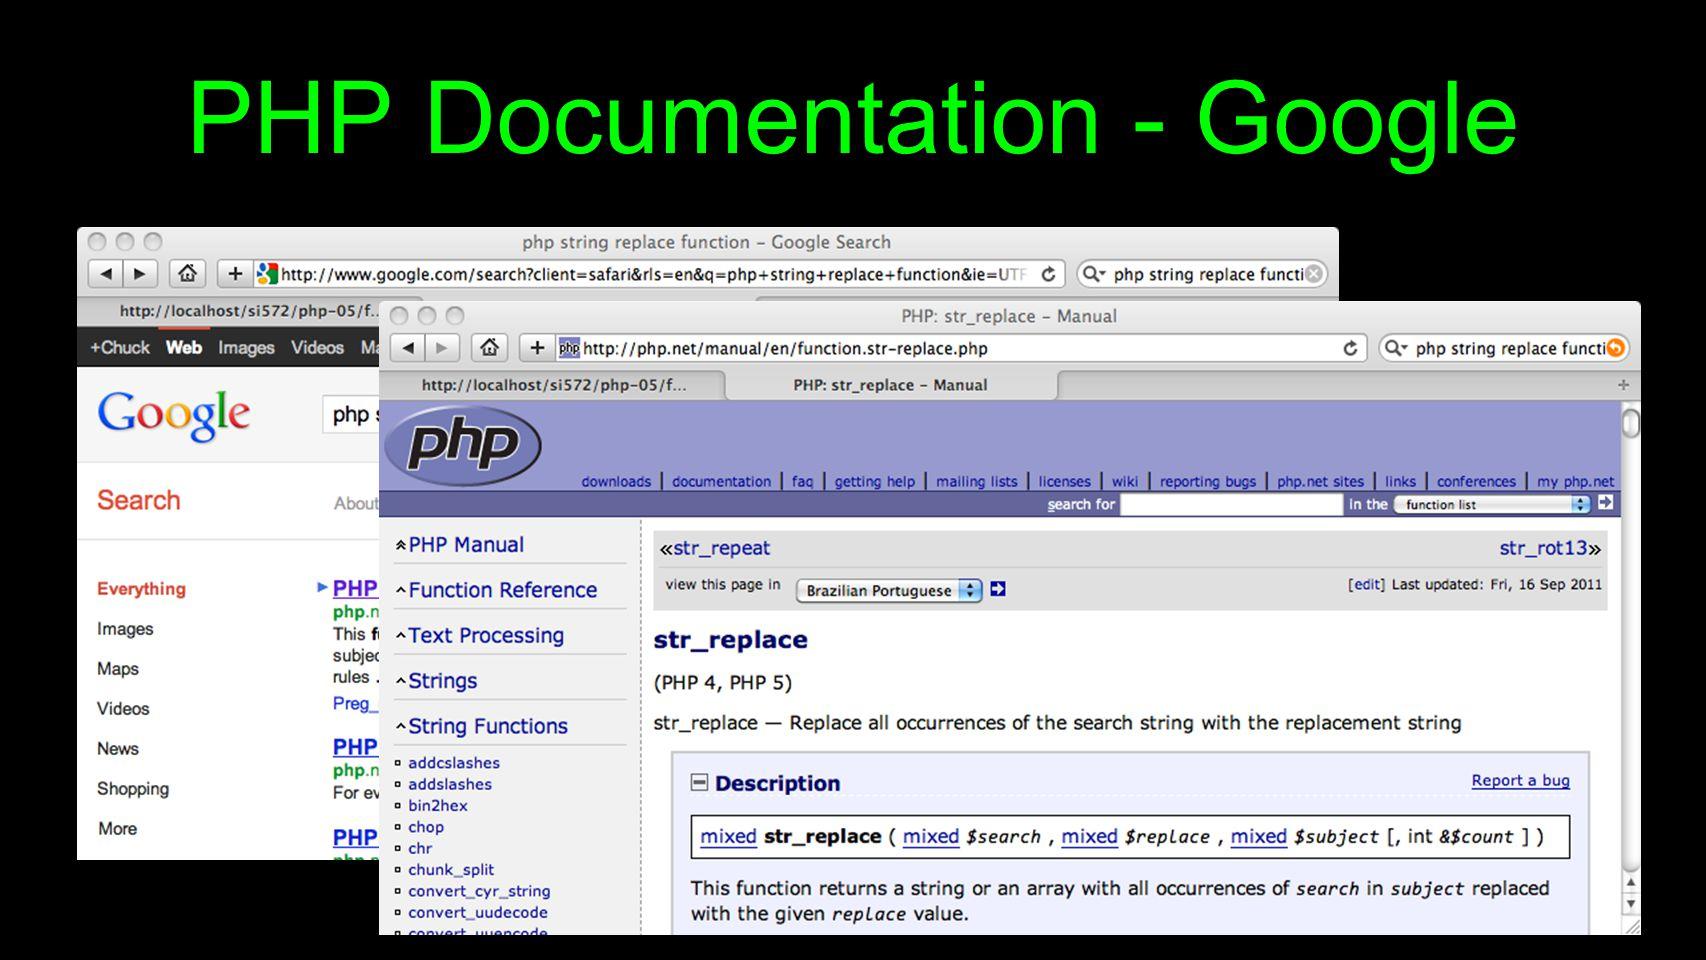 PHP Documentation - Google